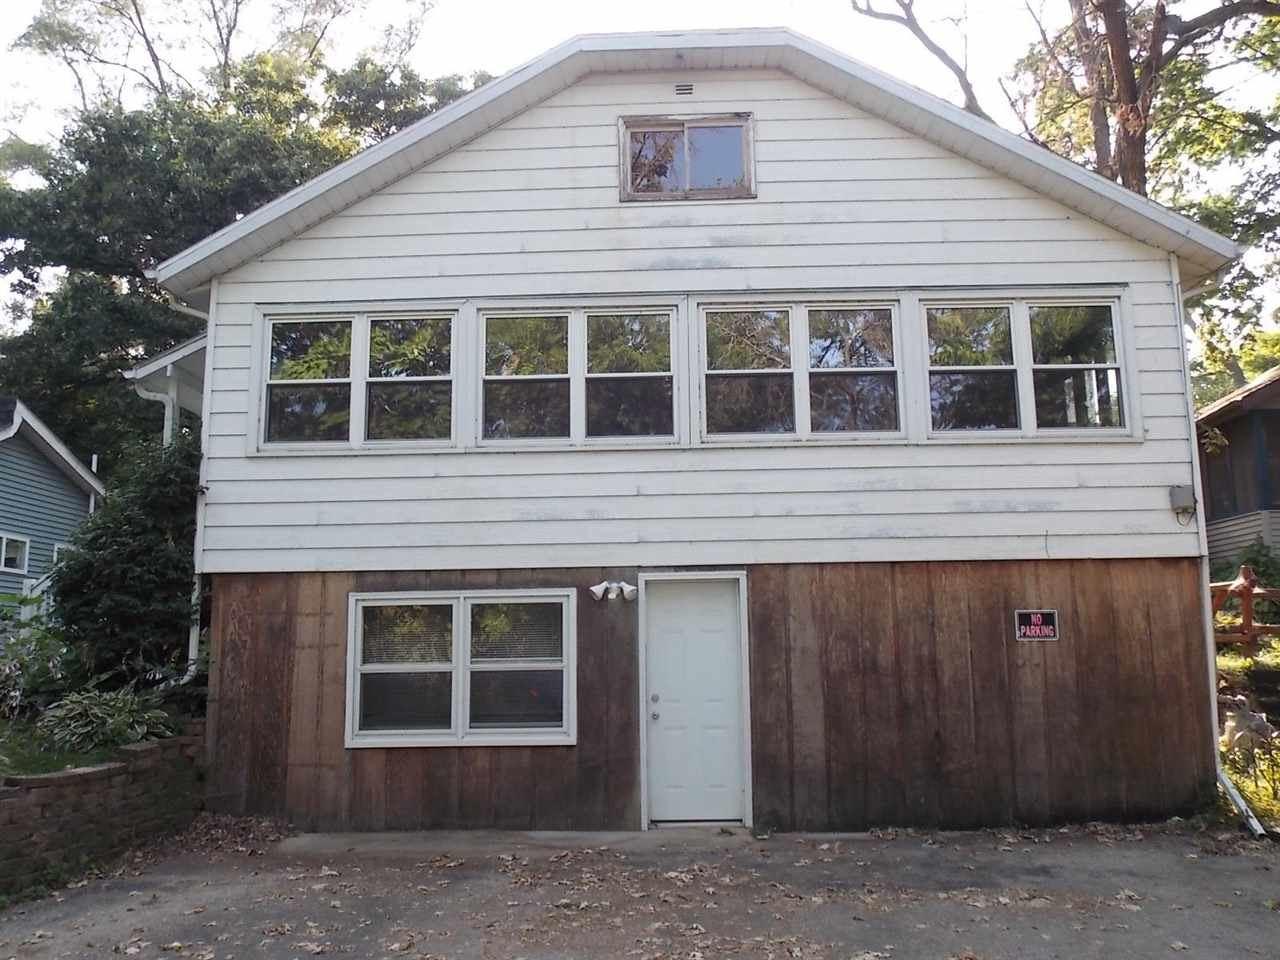 f_1915923 Real Estate in 53534 zip code